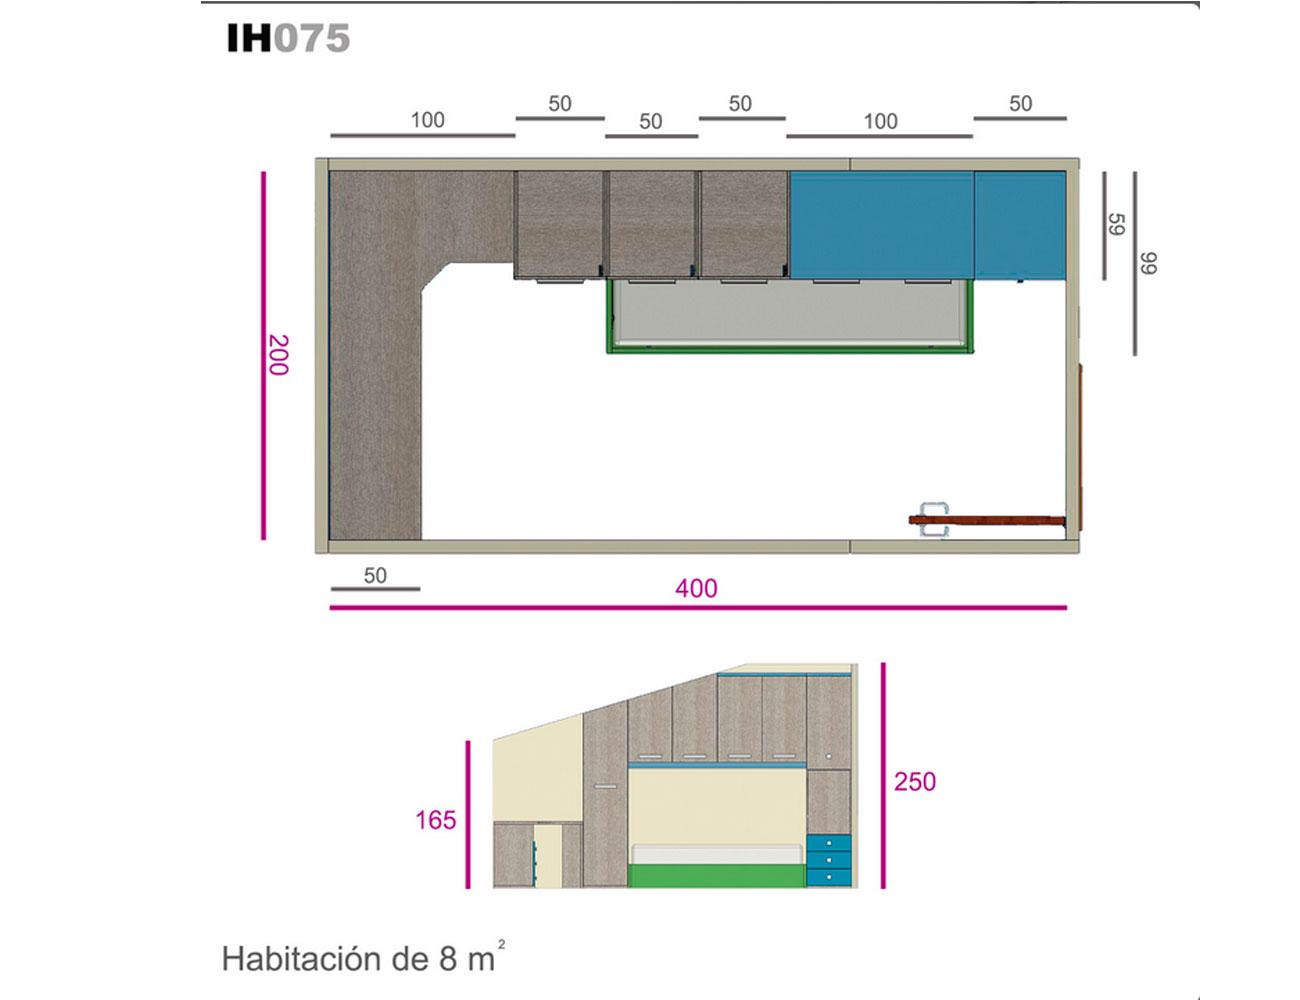 Ih075 medidas